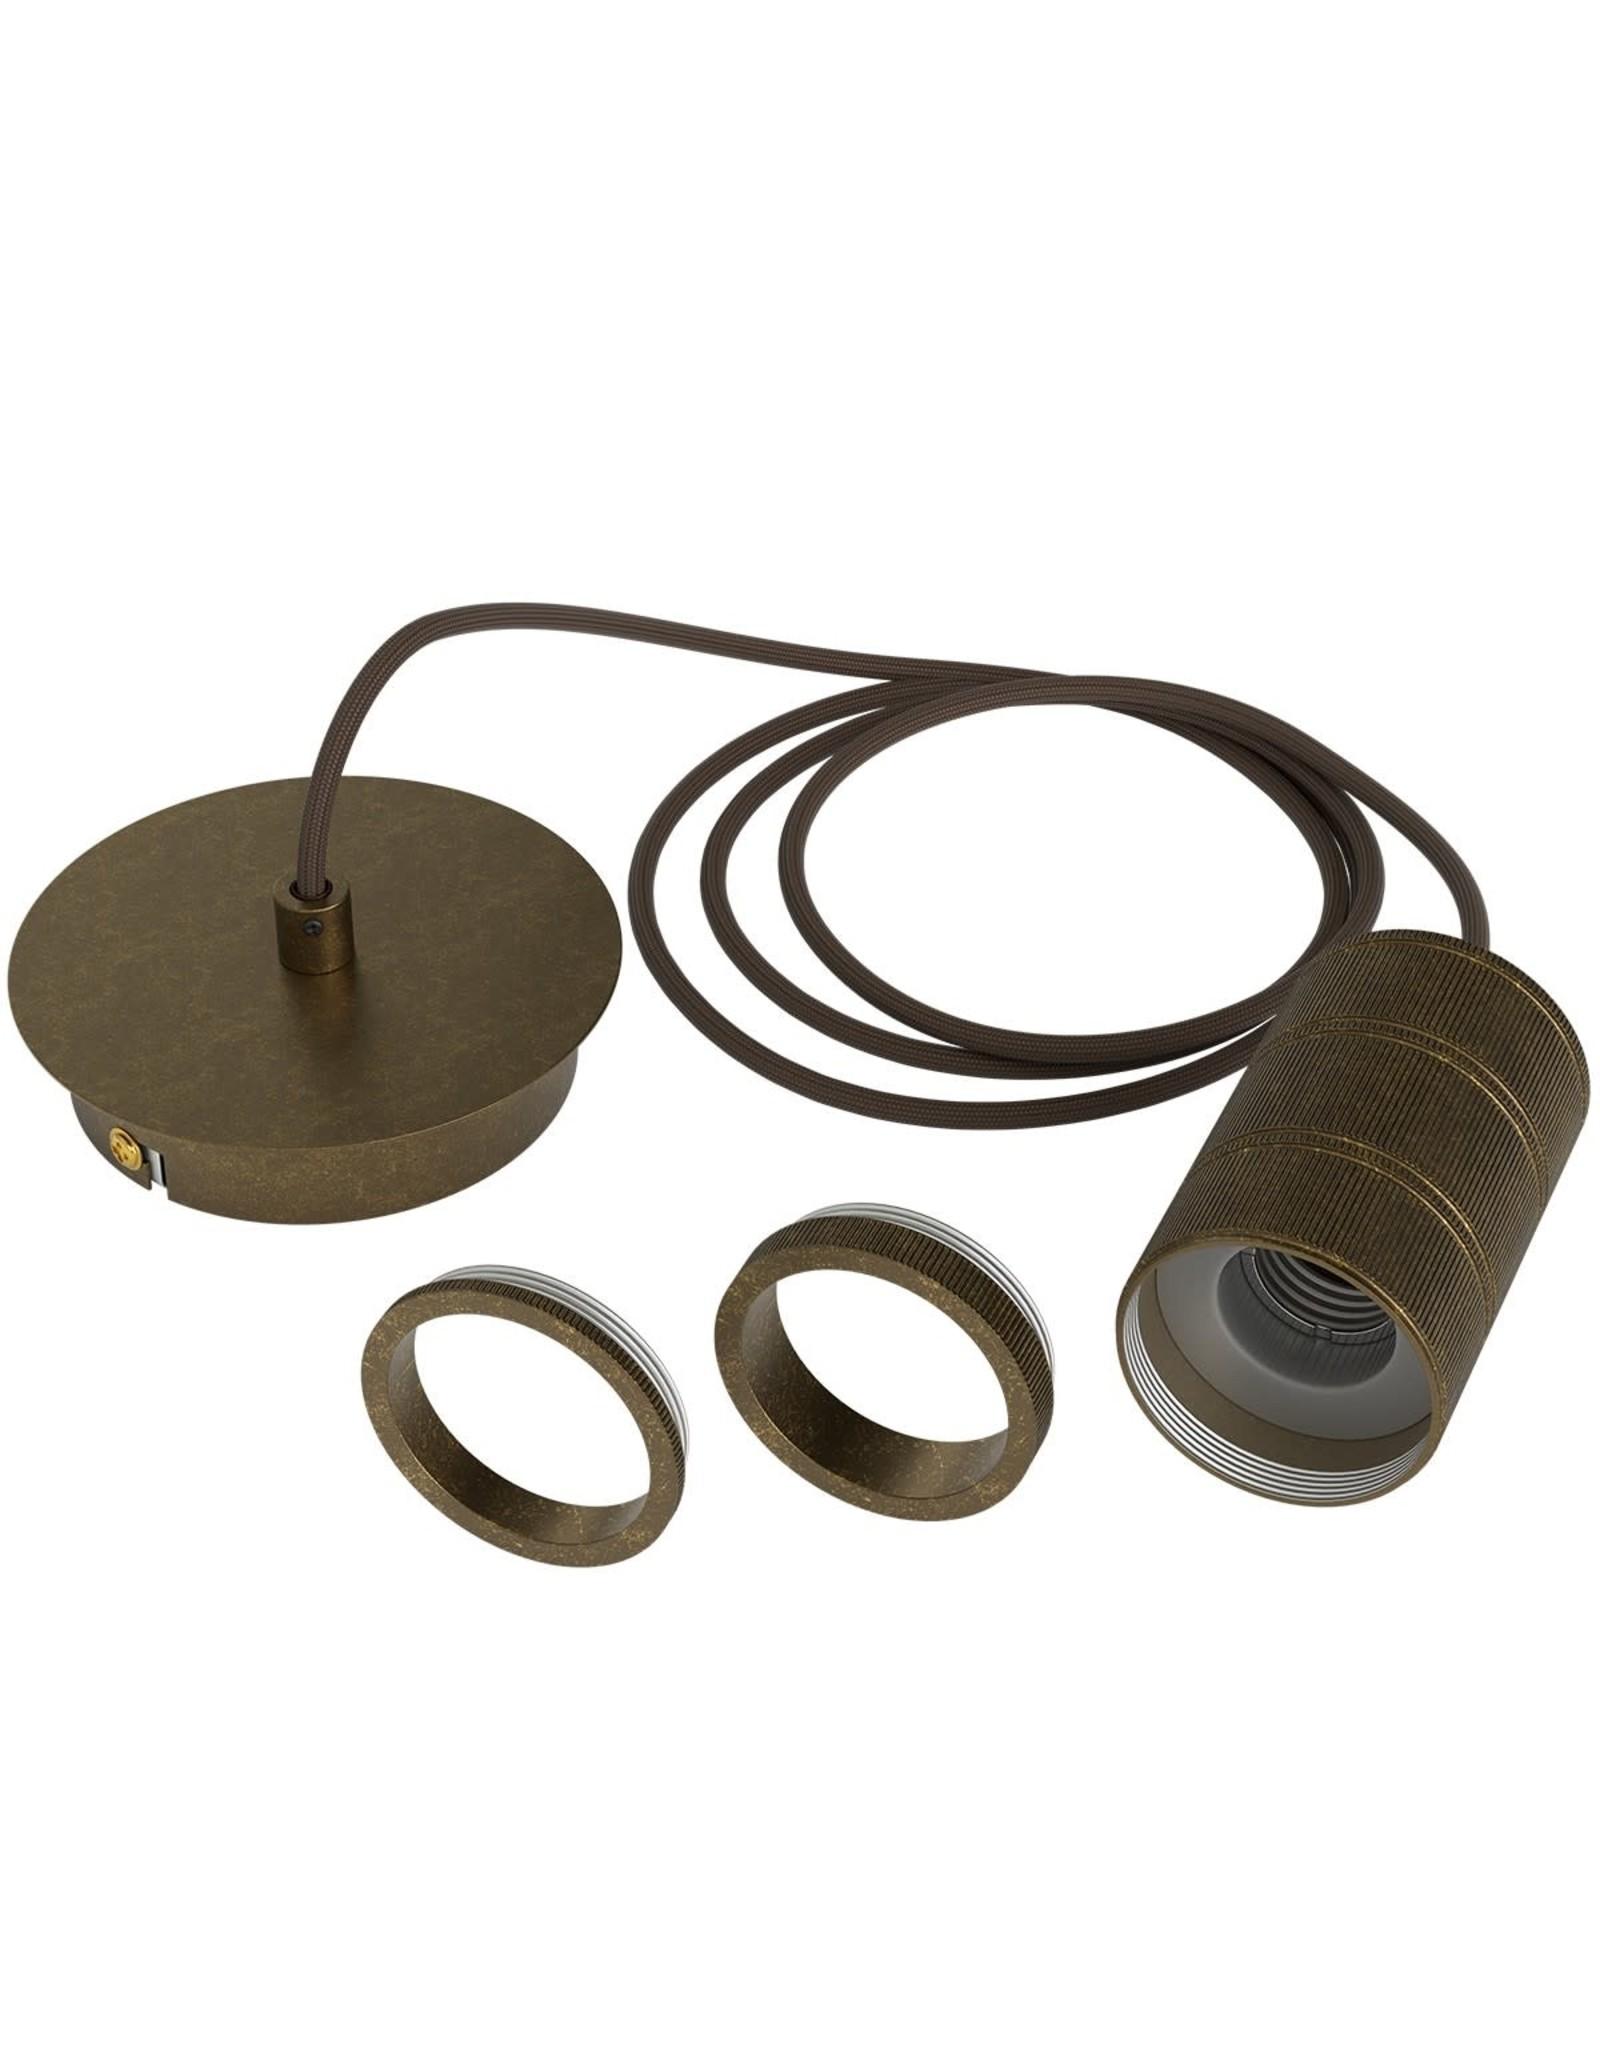 Hanglamp Retro Pendule - Brons E27